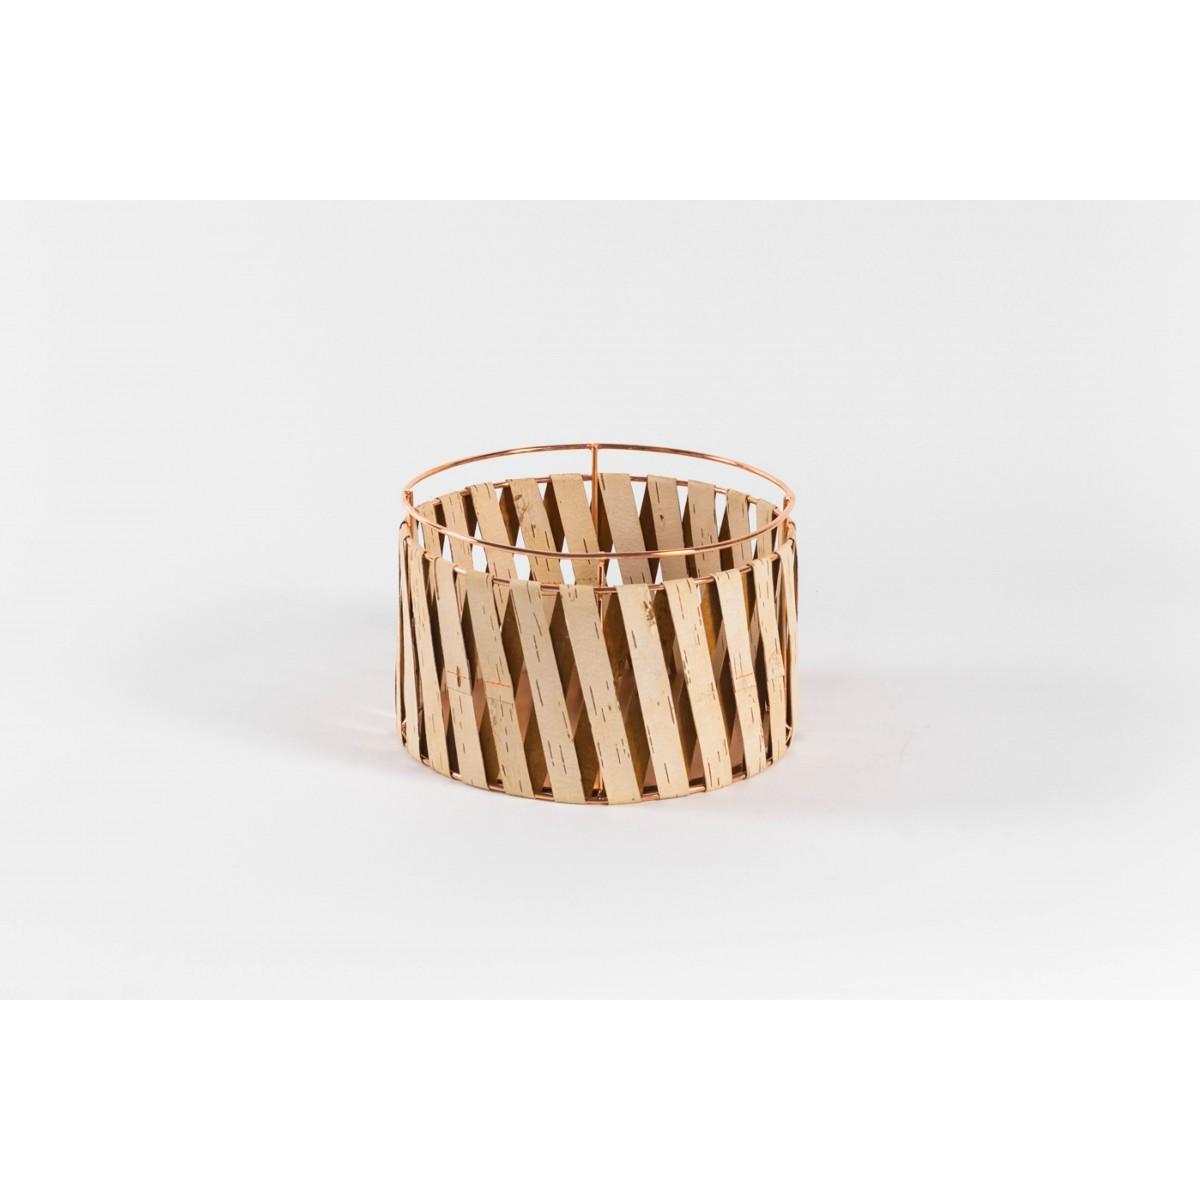 MOYA Körbe aus Birkenrinde Korob BA25 | Copper | Size M